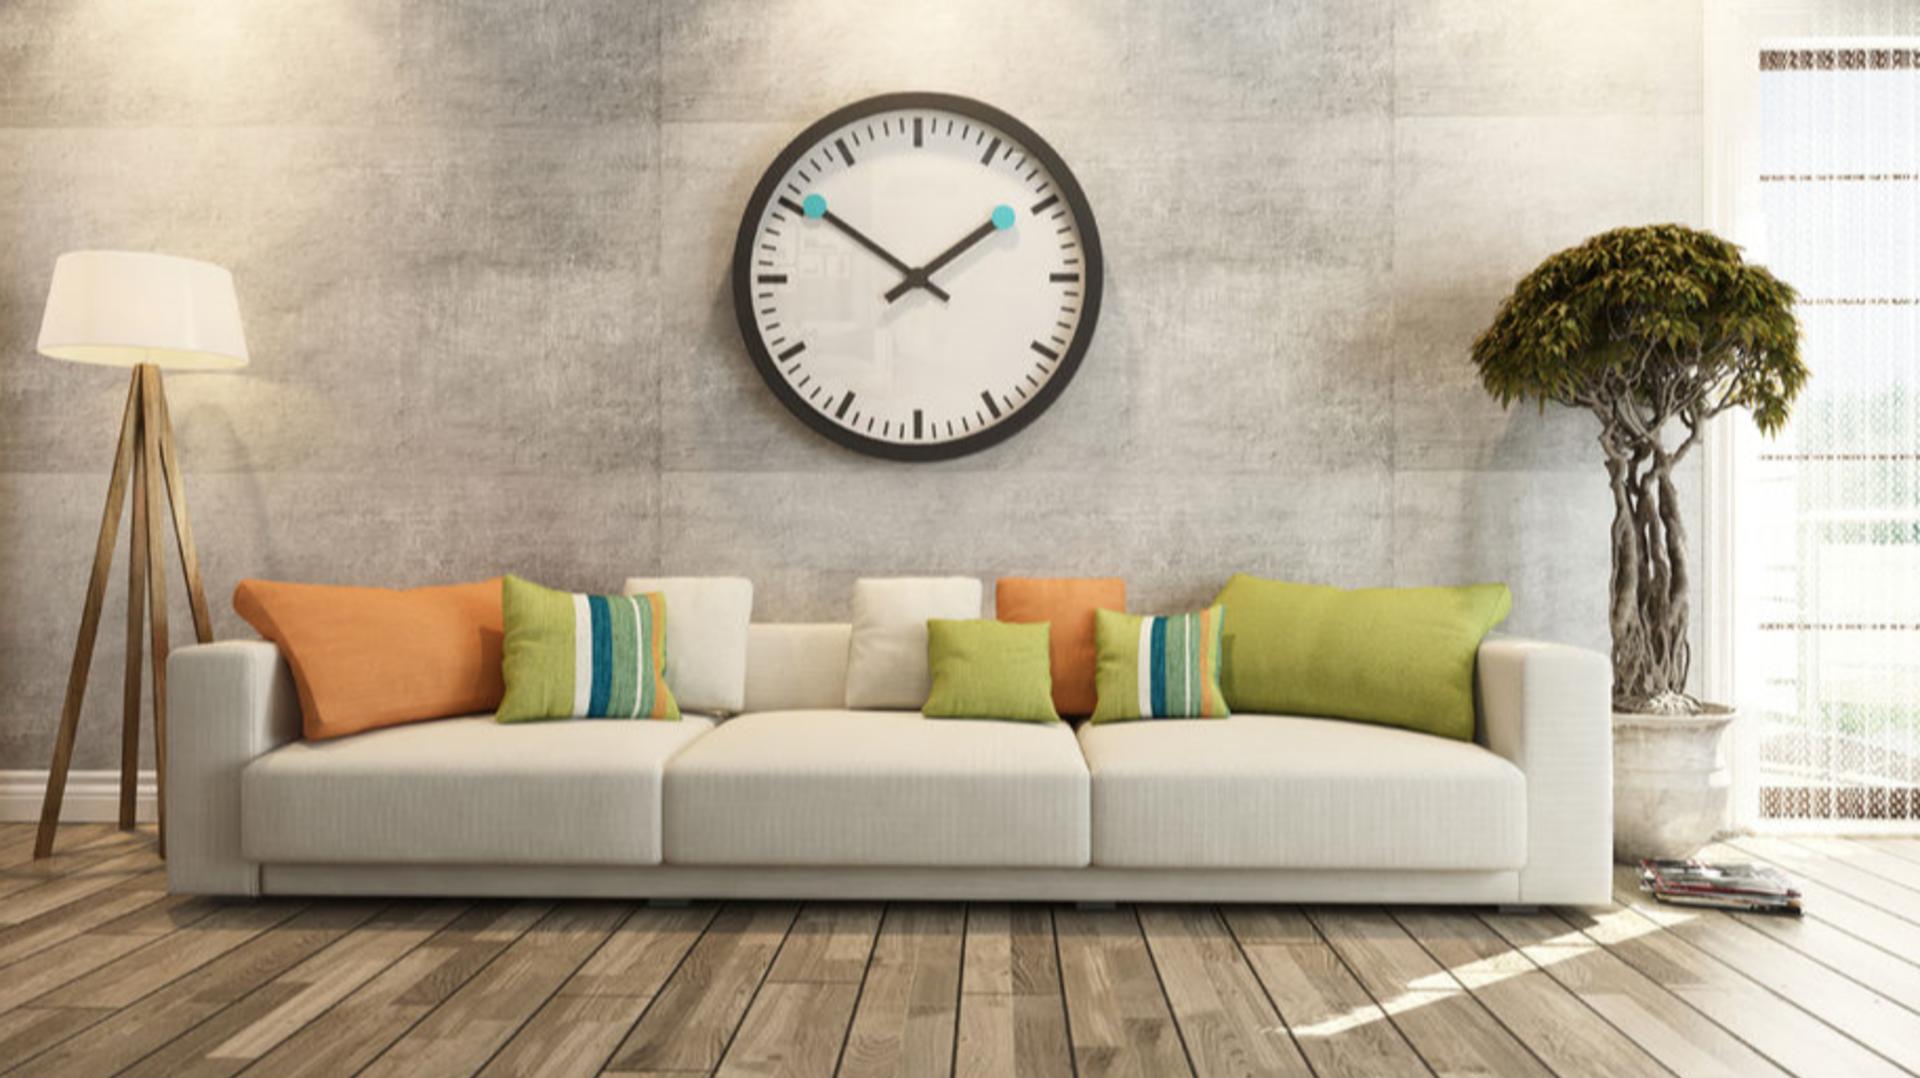 2019's Hottest Home Decor